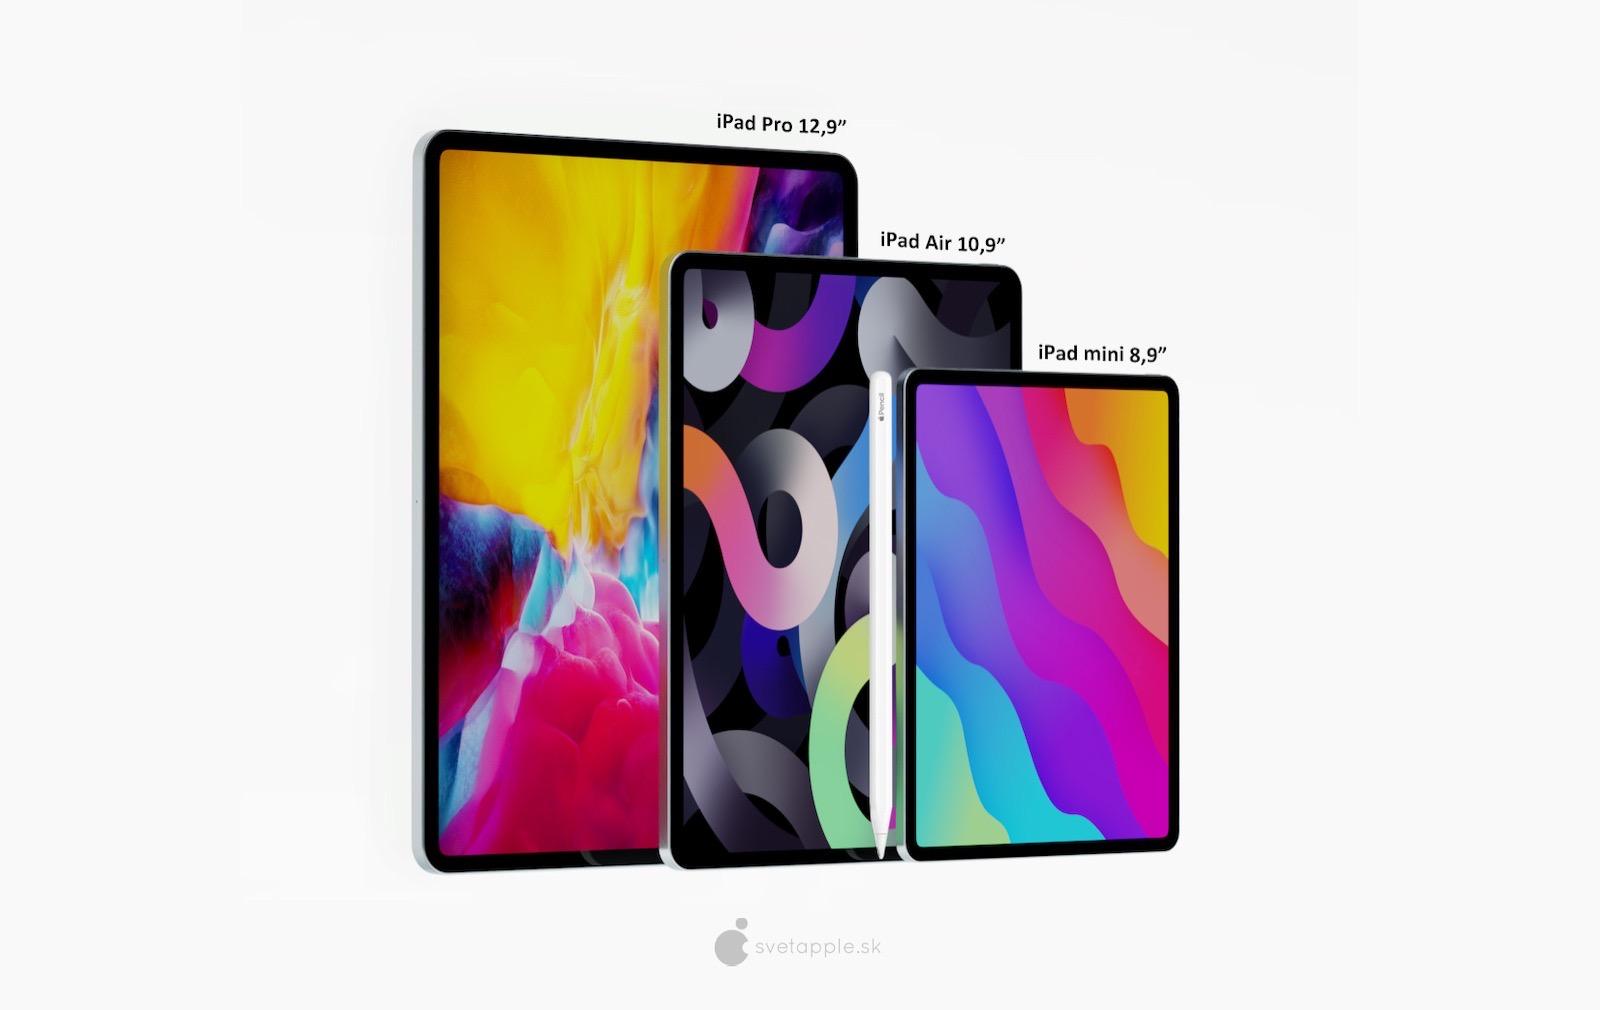 Ipad mini pro concept image 2